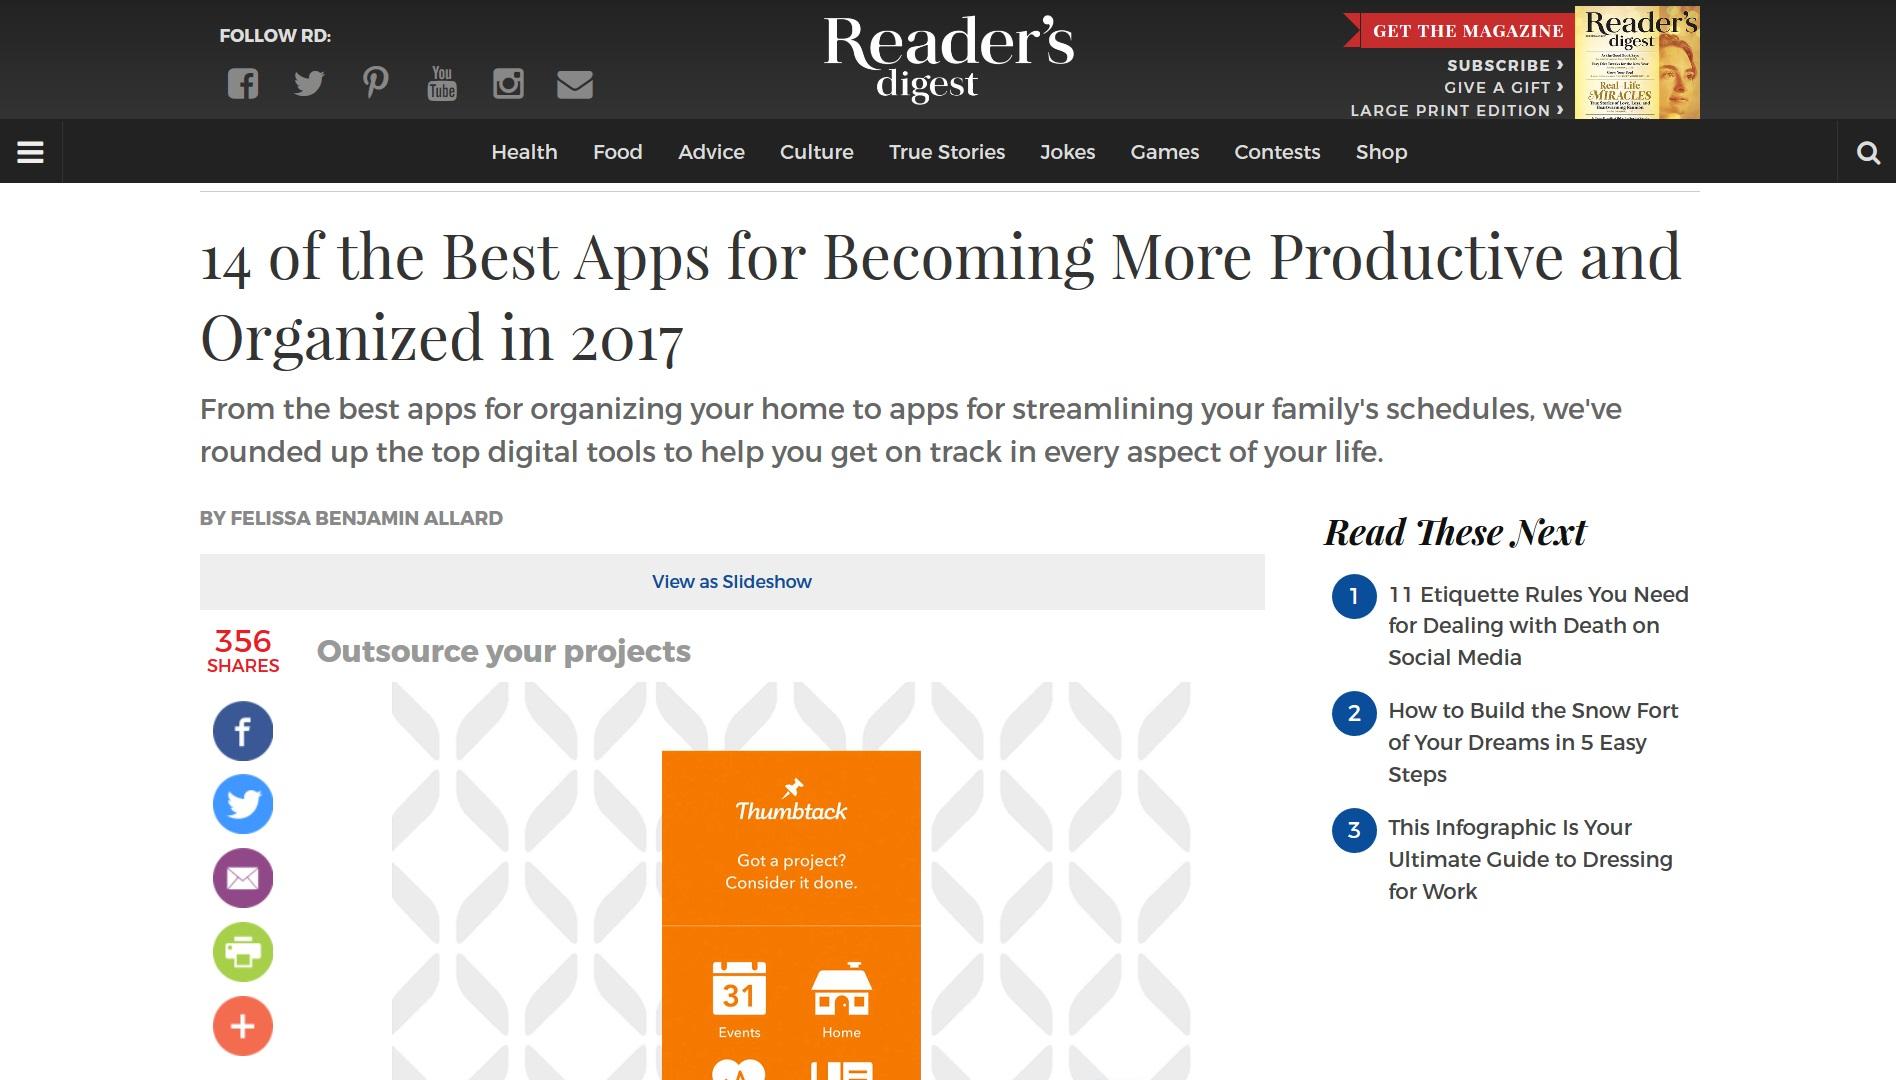 14 Best Apps